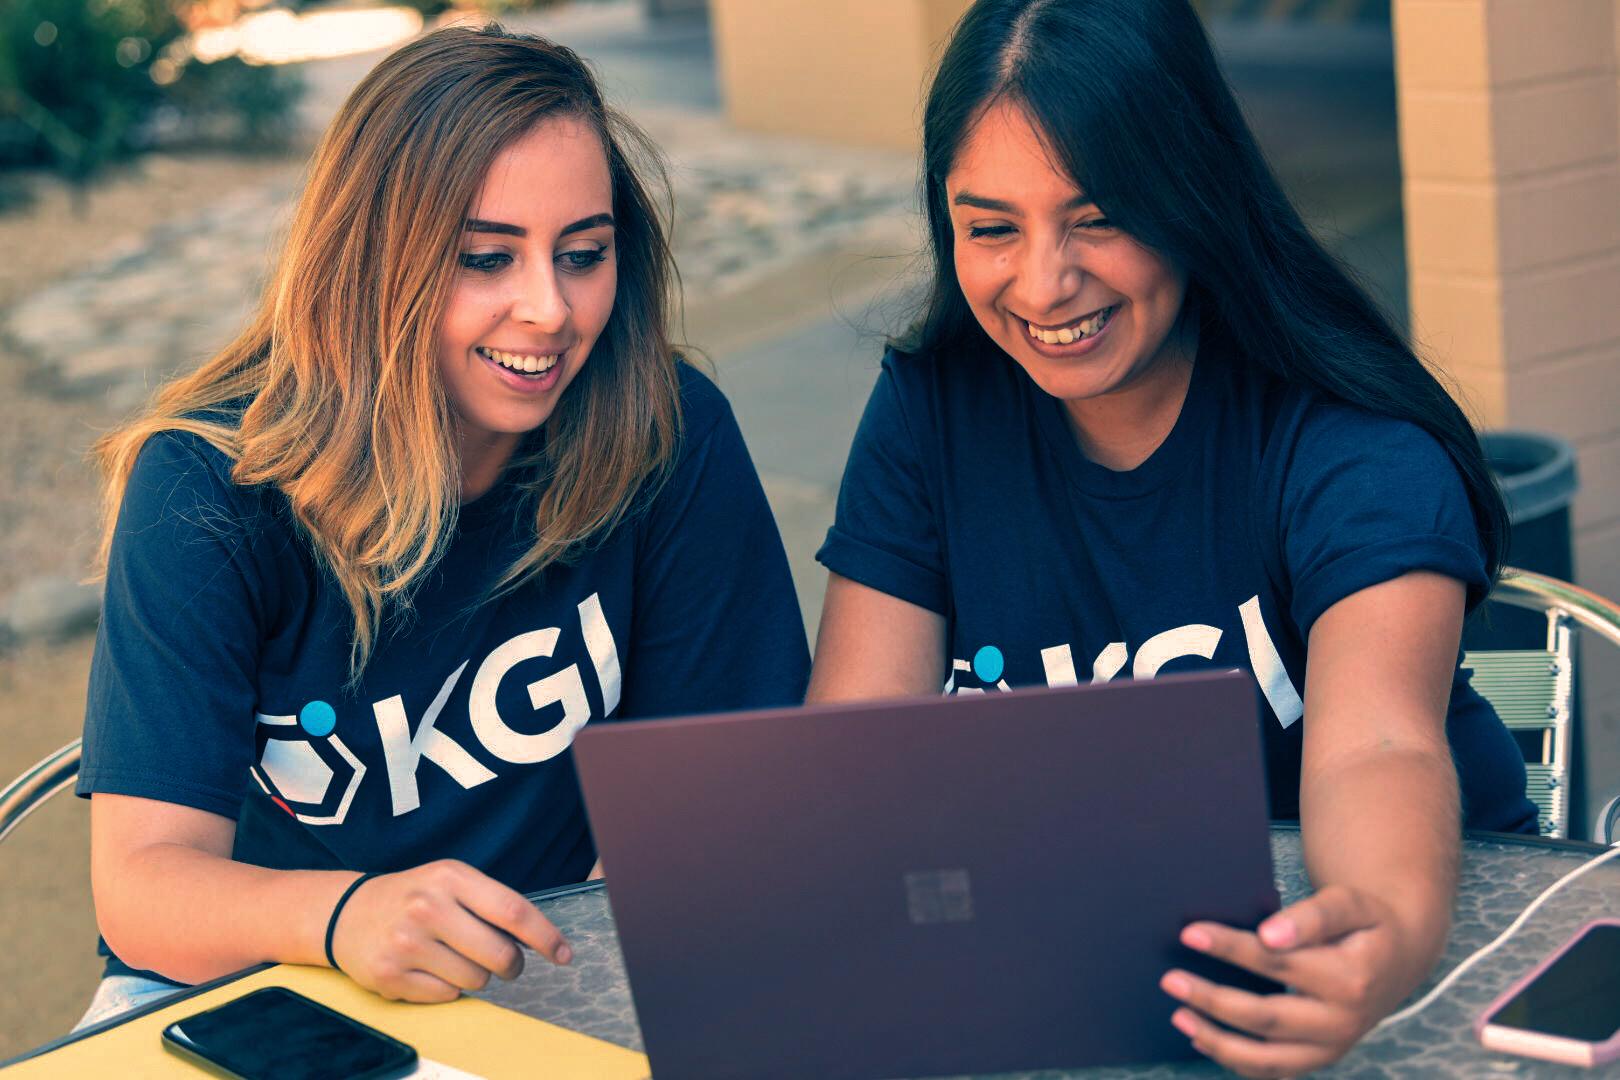 kgi students